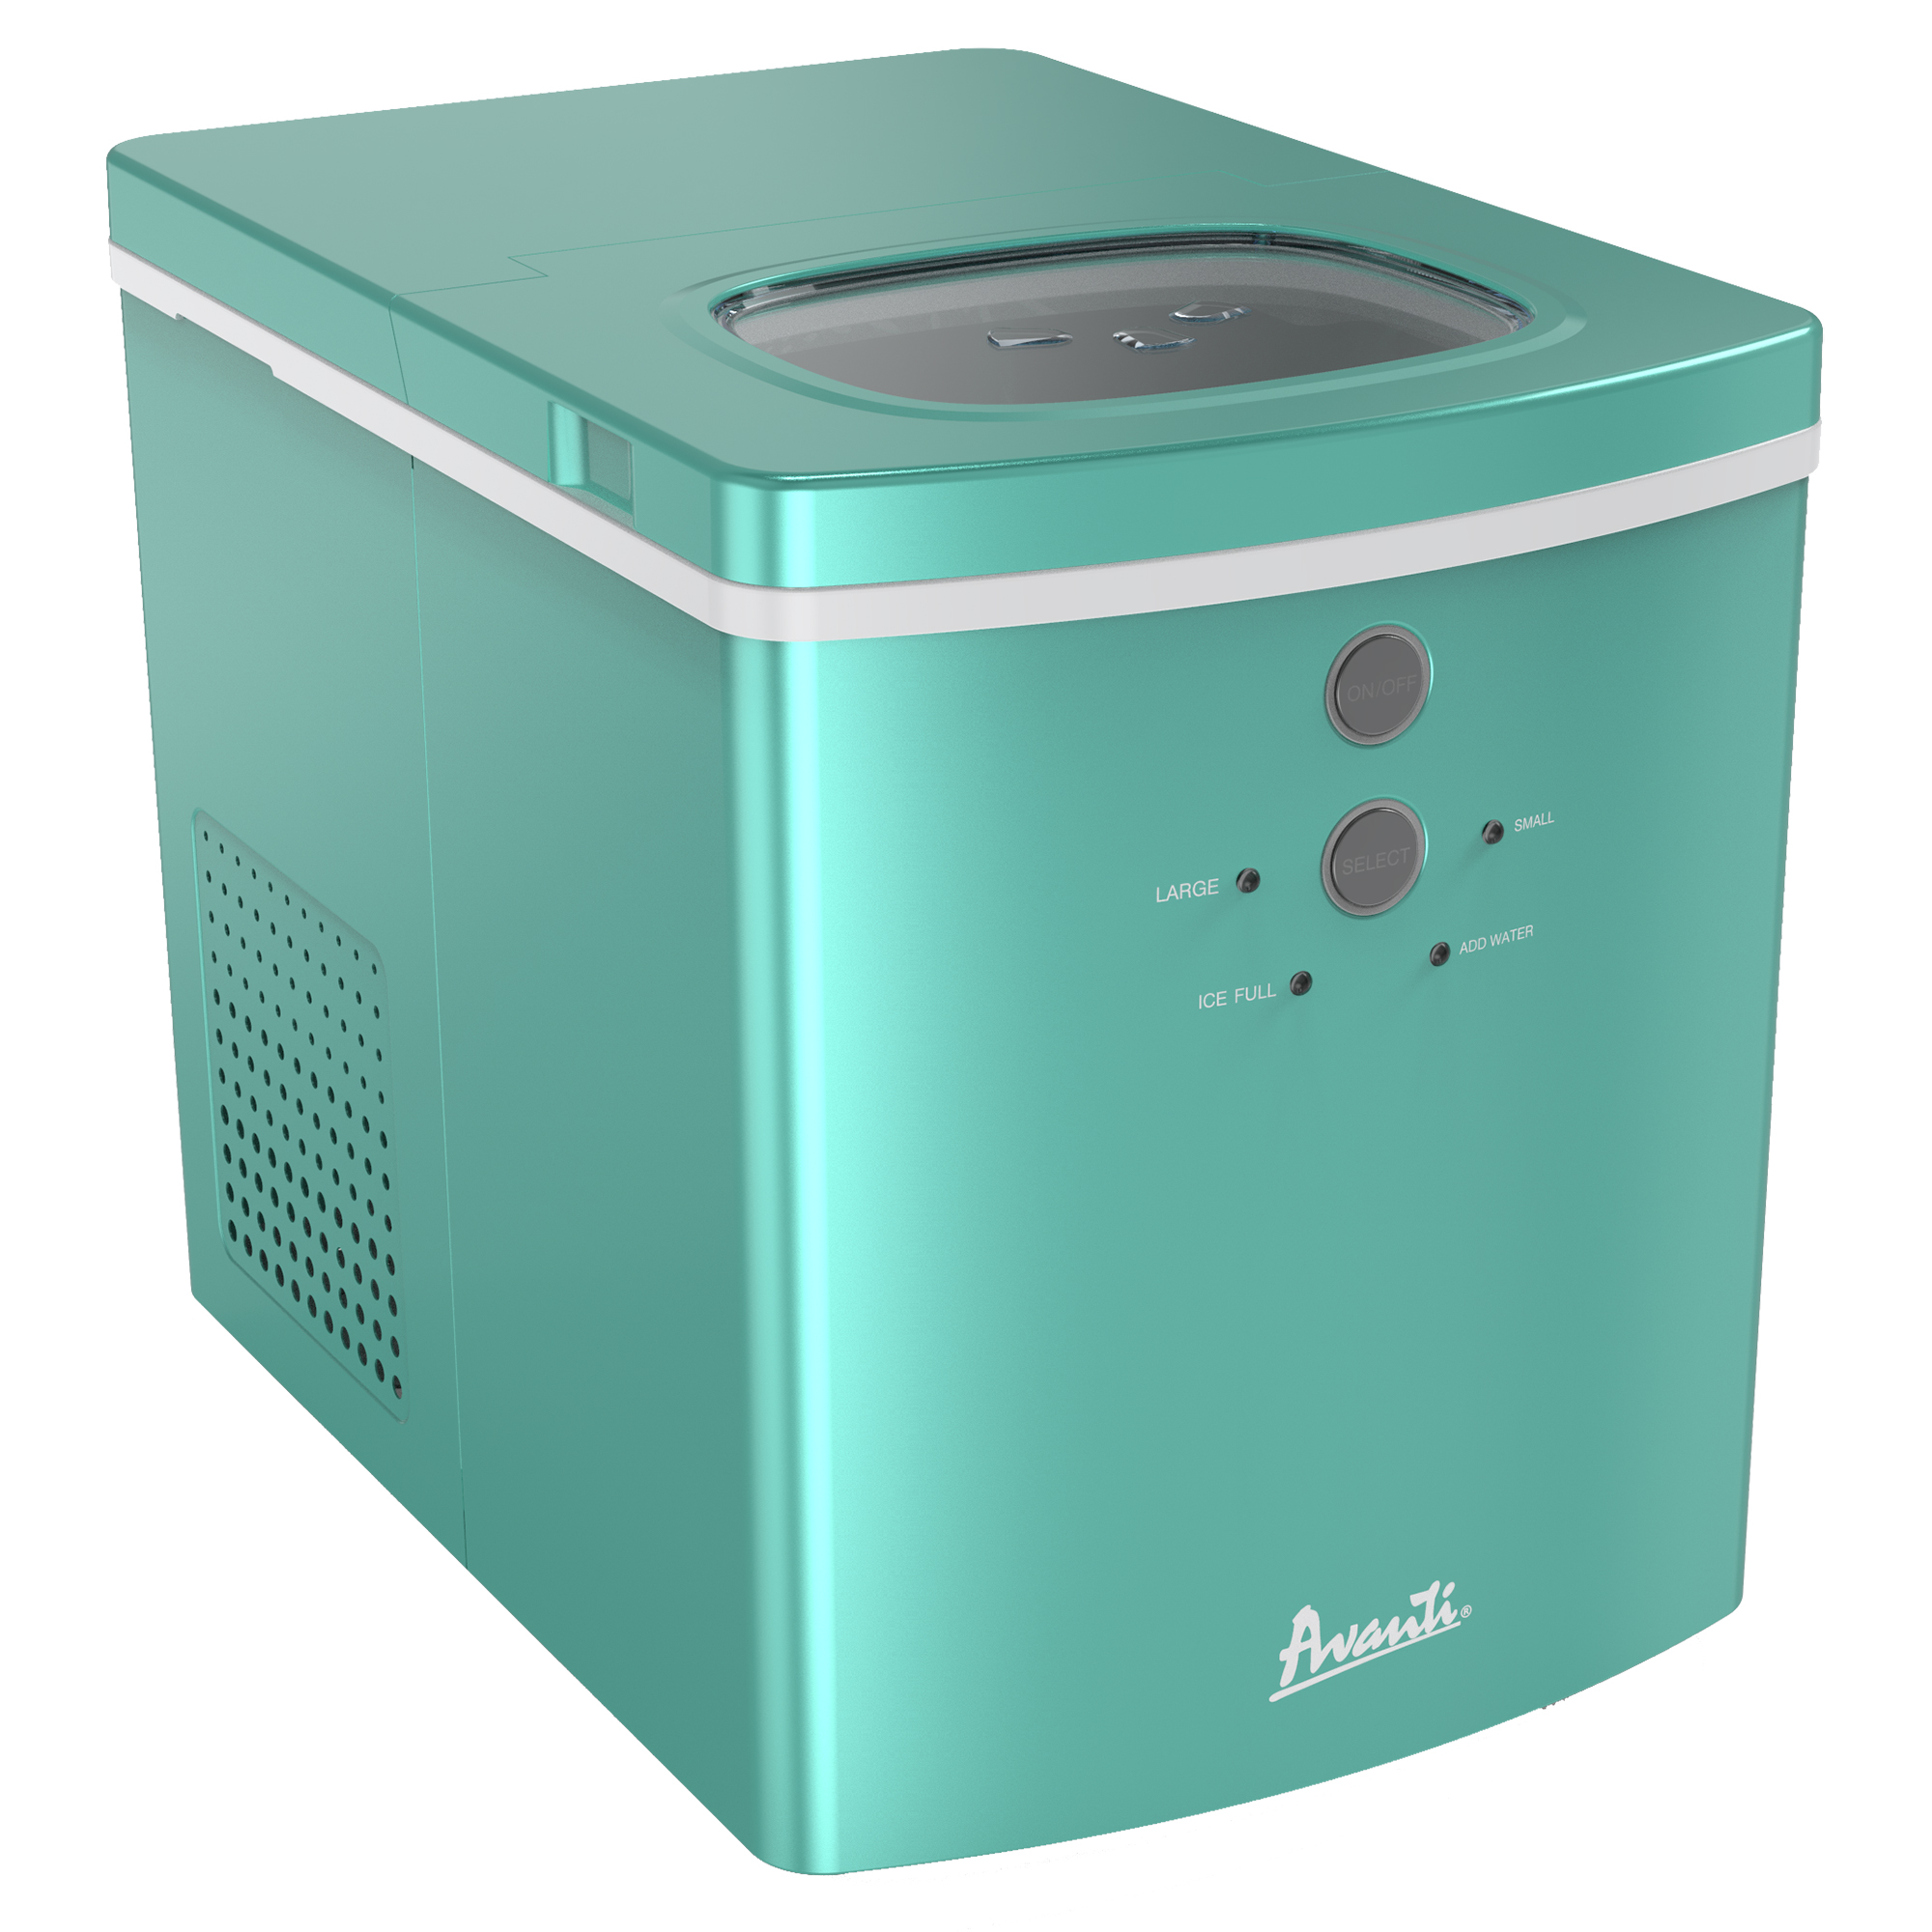 Avanti Portable Countertop Ice Maker, Aqua photo